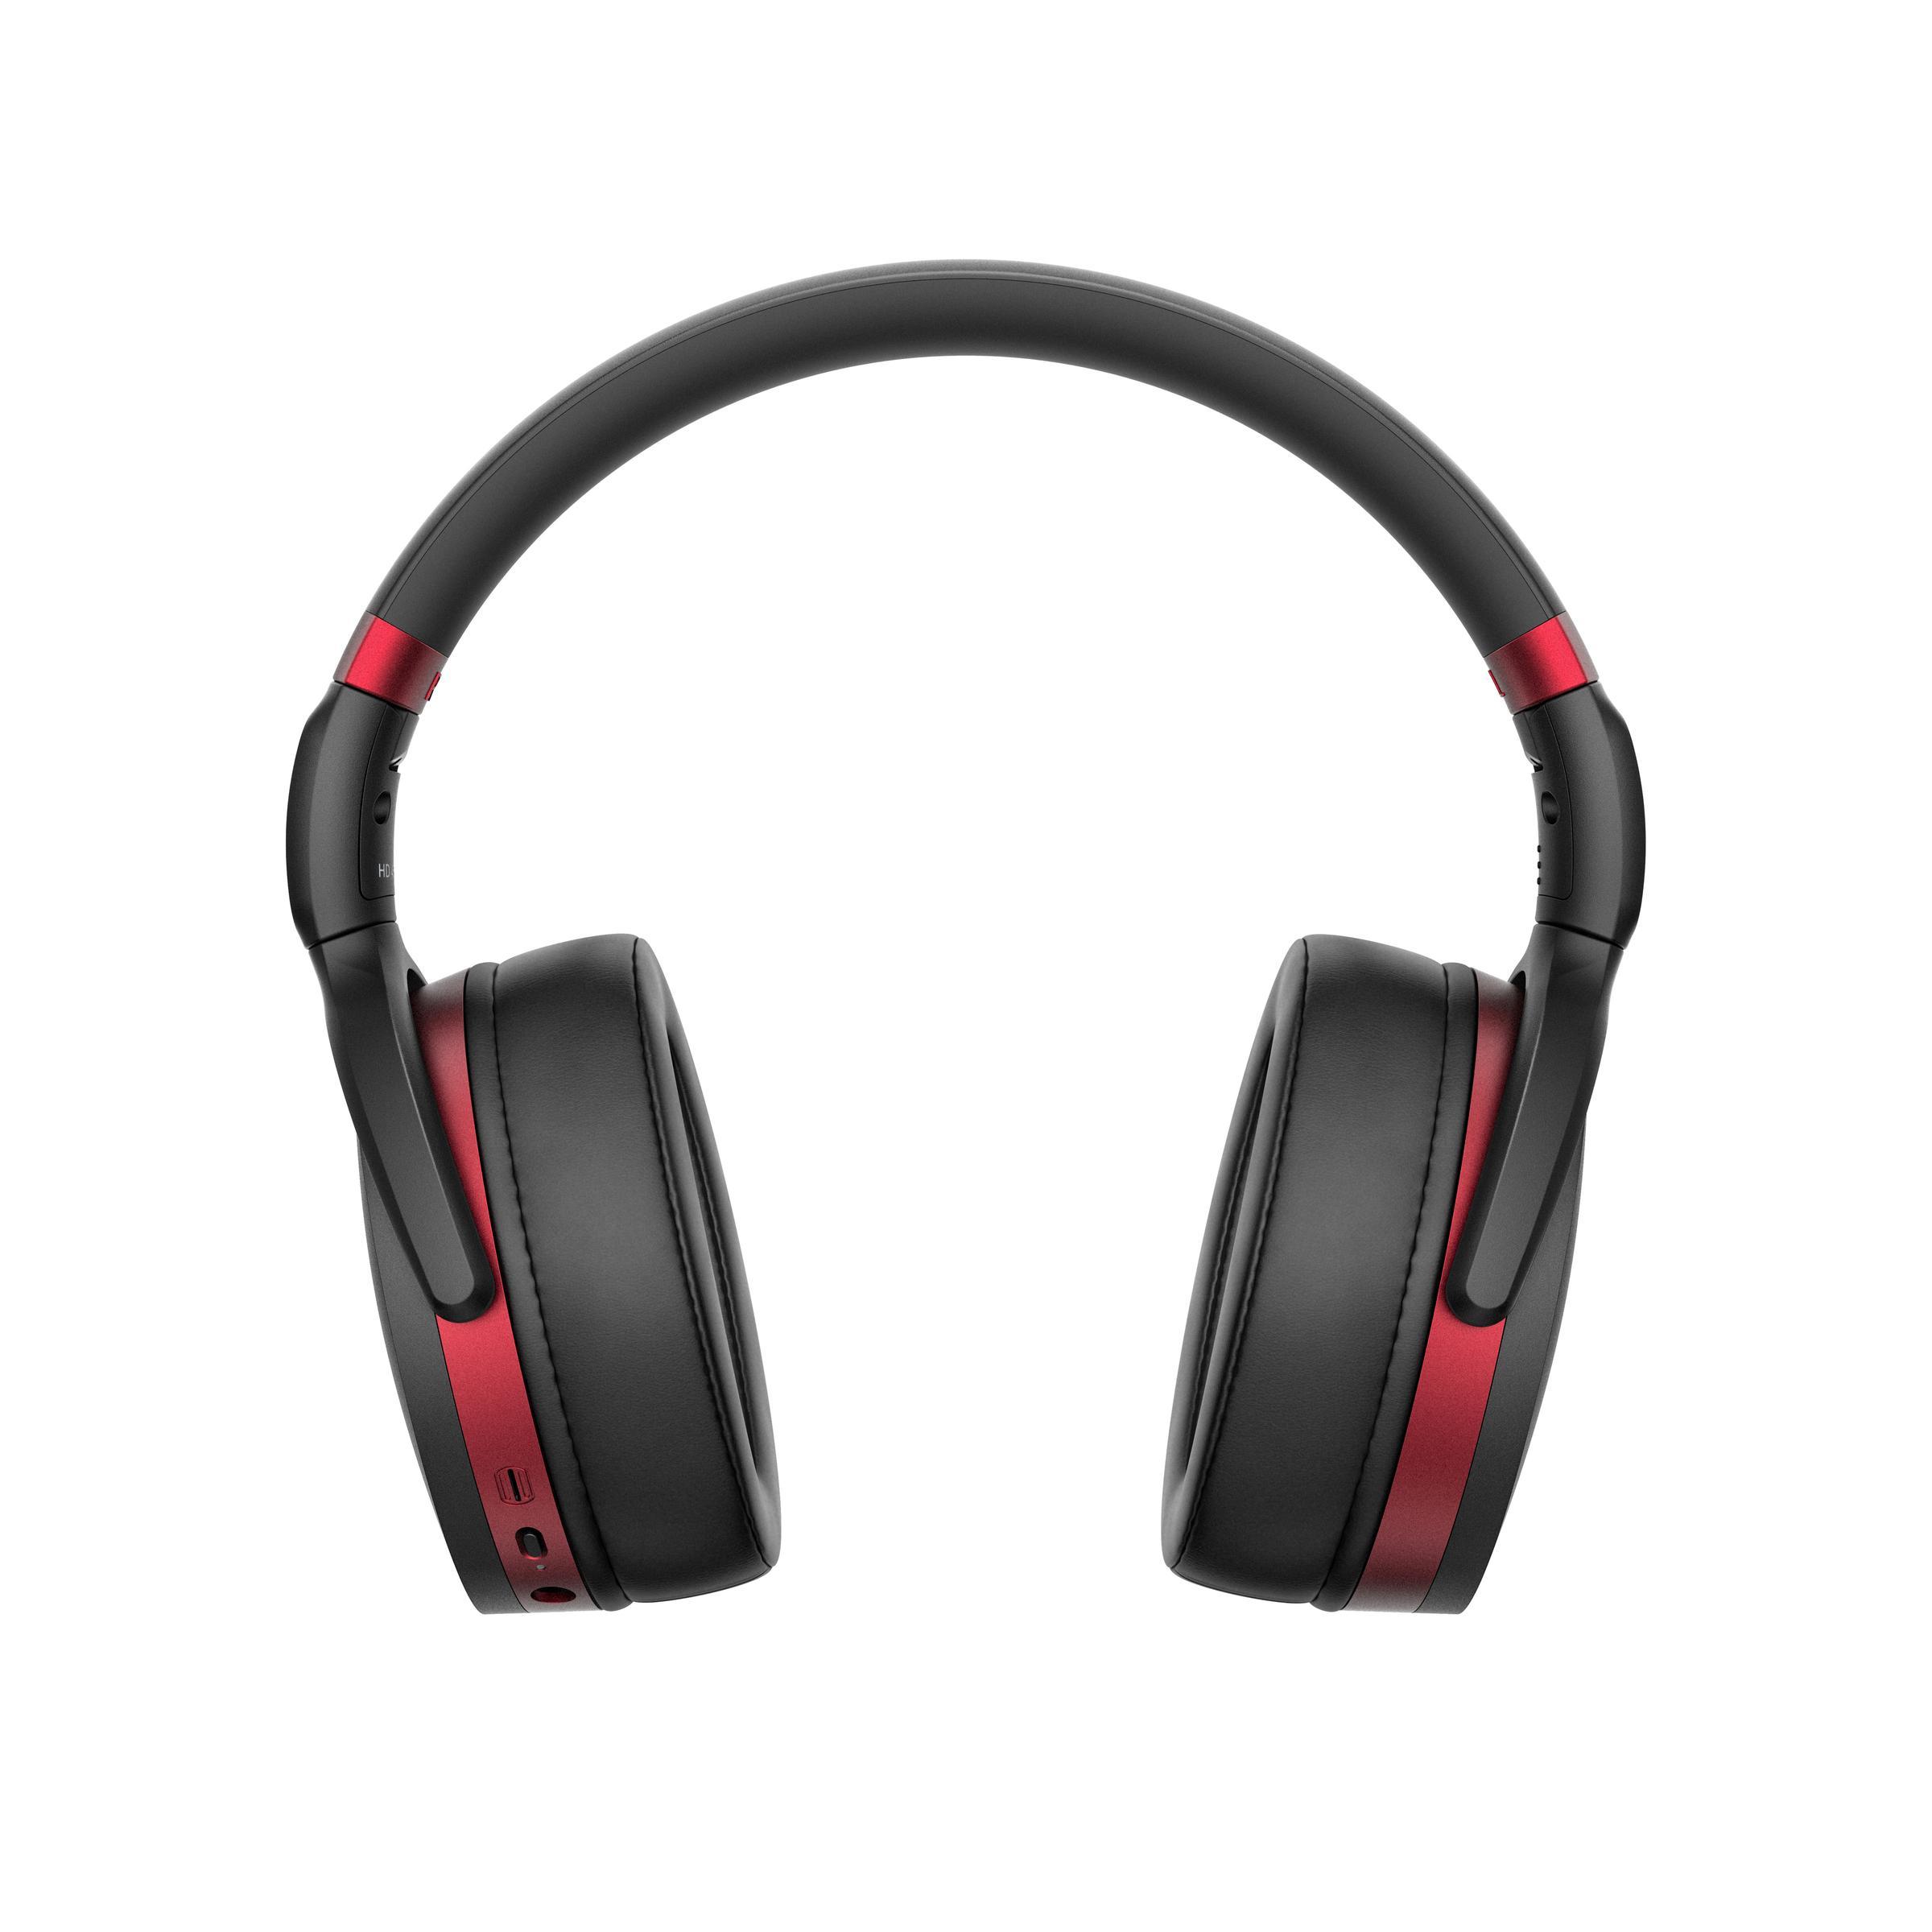 Sennheiser HD 458BT Noise Cancelling Bluetooth Over-Ear Headphones £99 via Vodafone VeryMe